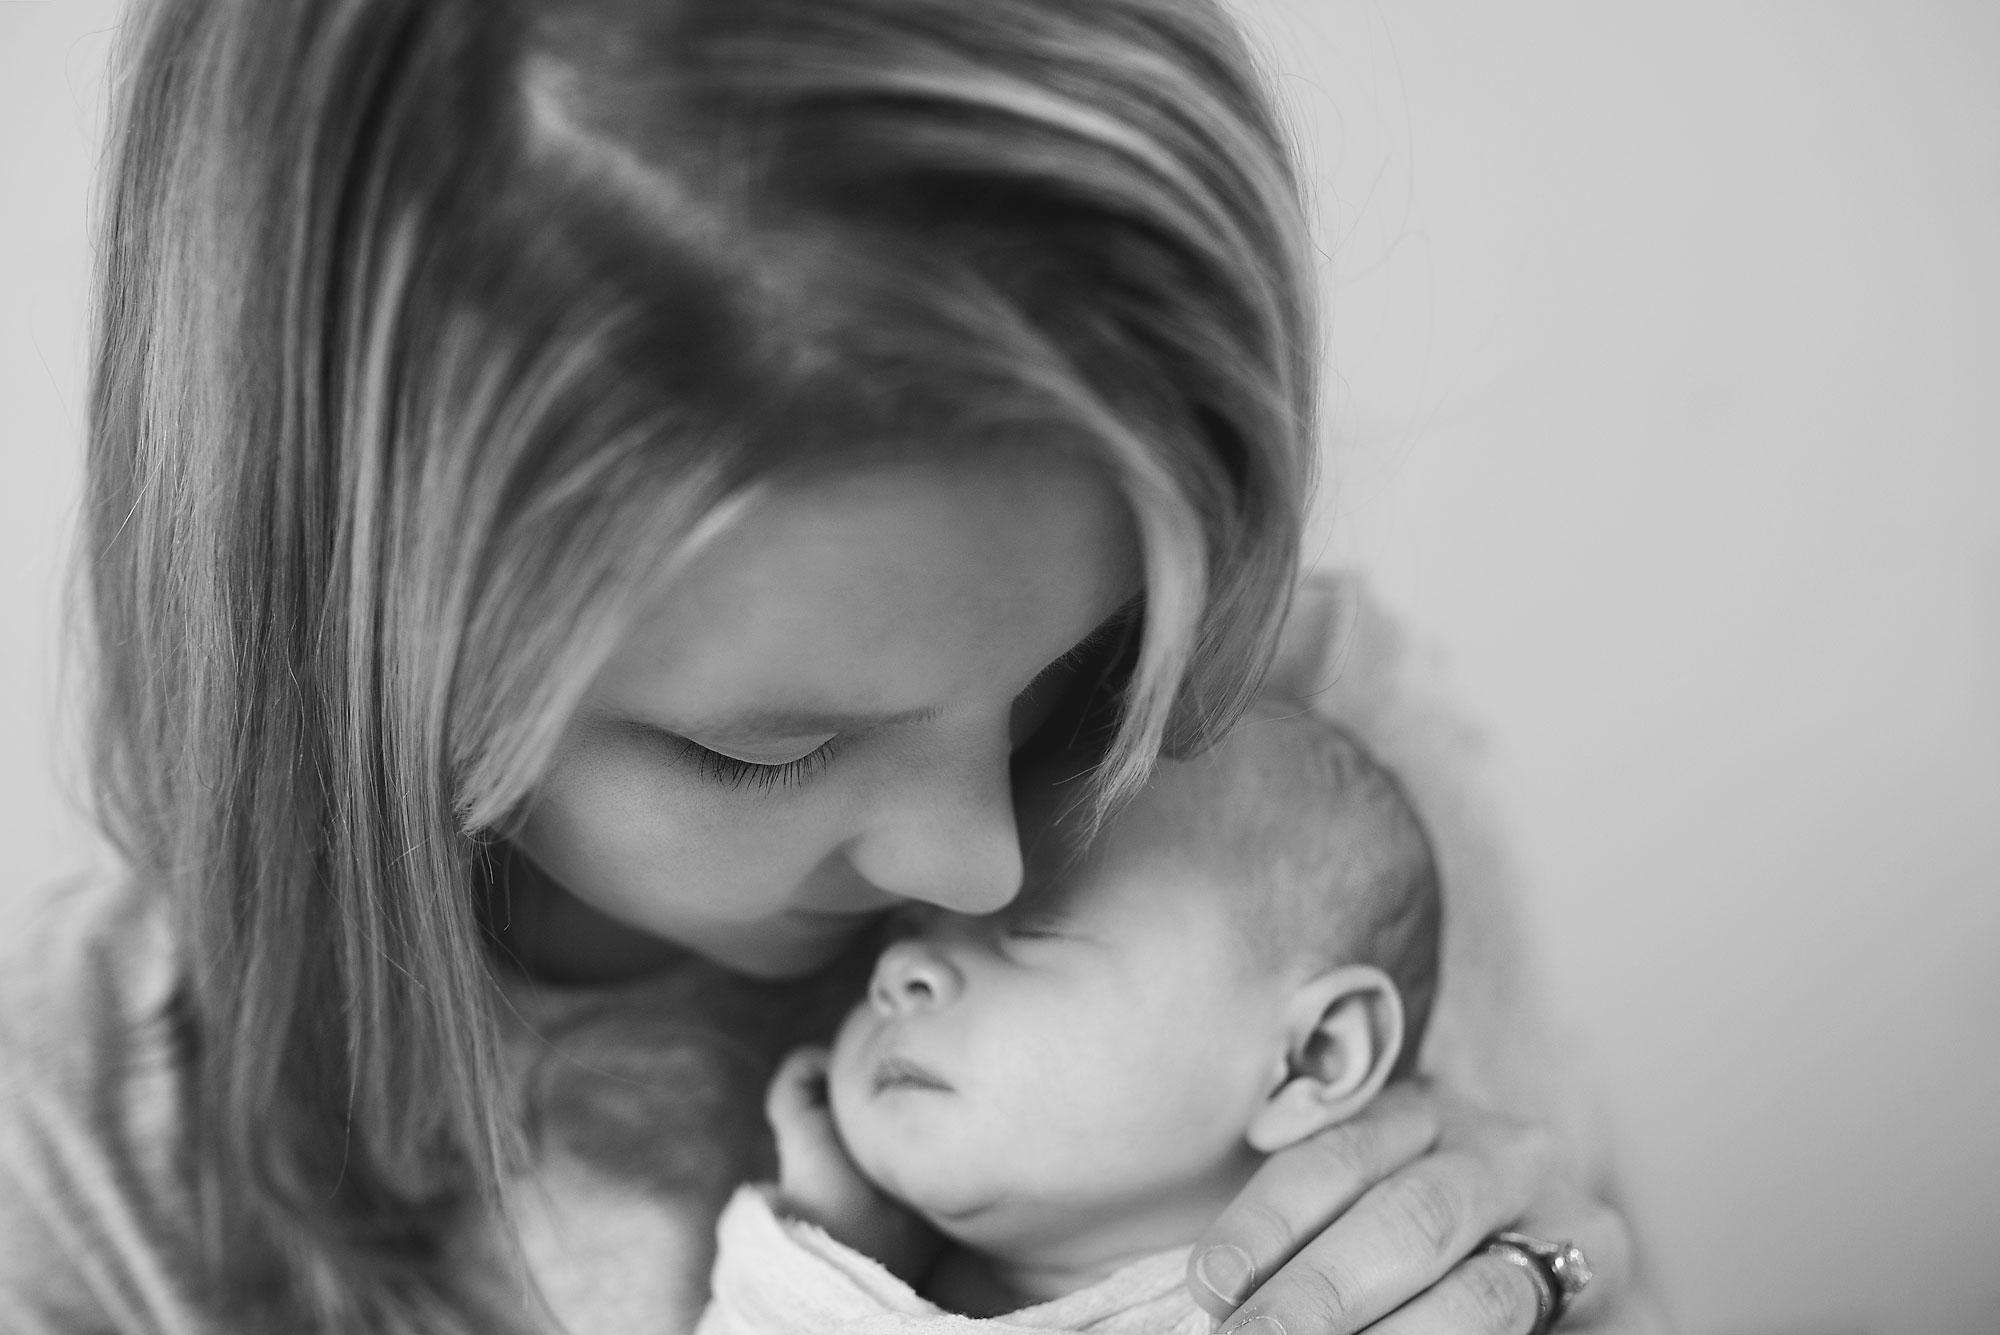 Edie-Mundy-1-month-old-042-copyb&W.jpg